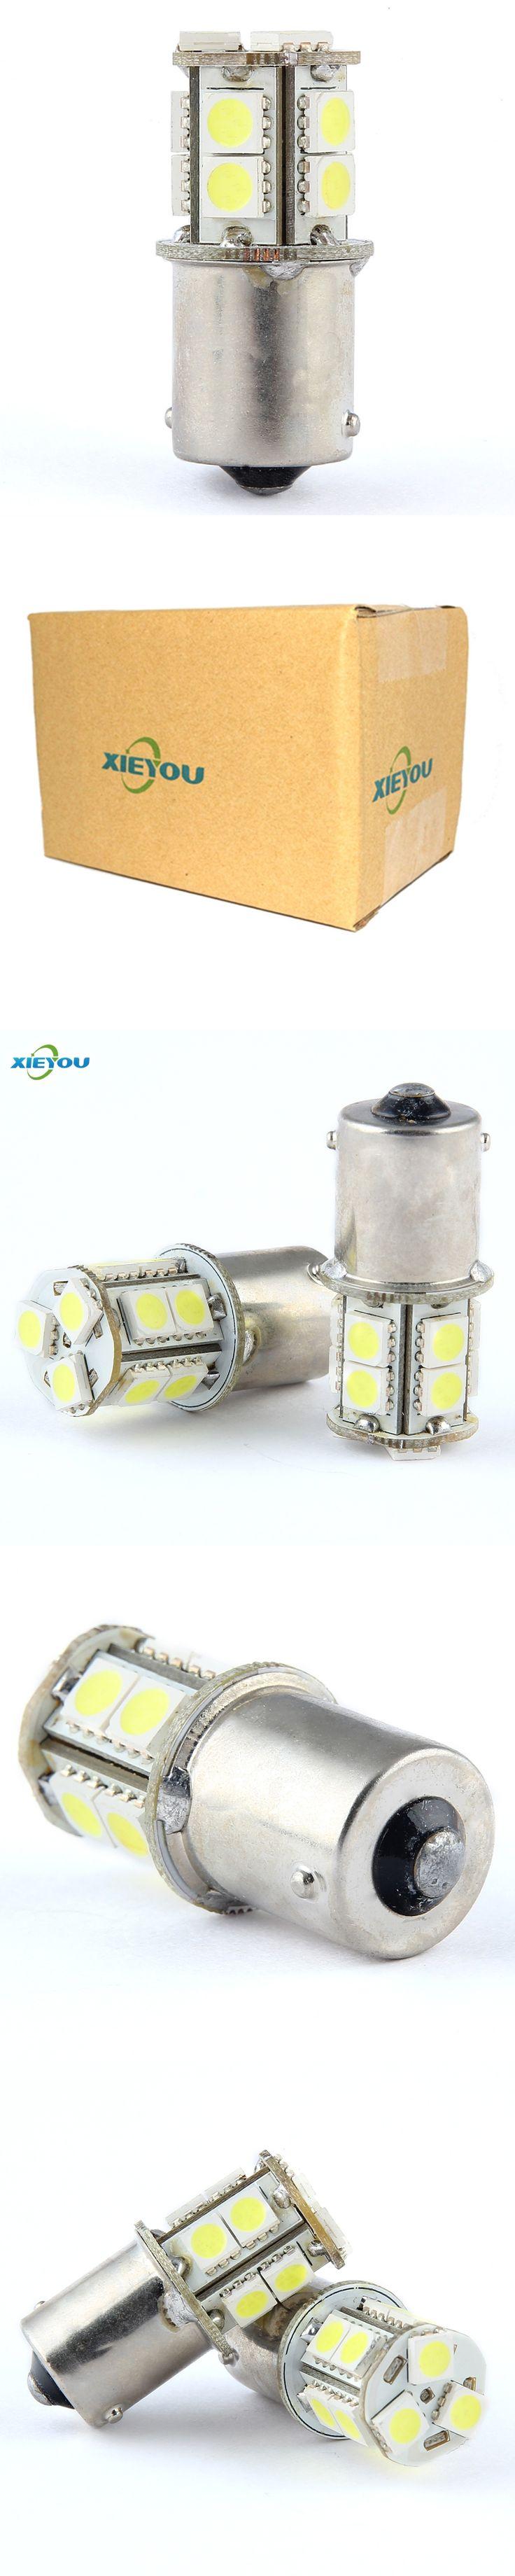 2PCS 1156 S25 13-SMD 12V LED Car Lights Great Brightness For Brake Turn Singal Rear Reverse  Lights